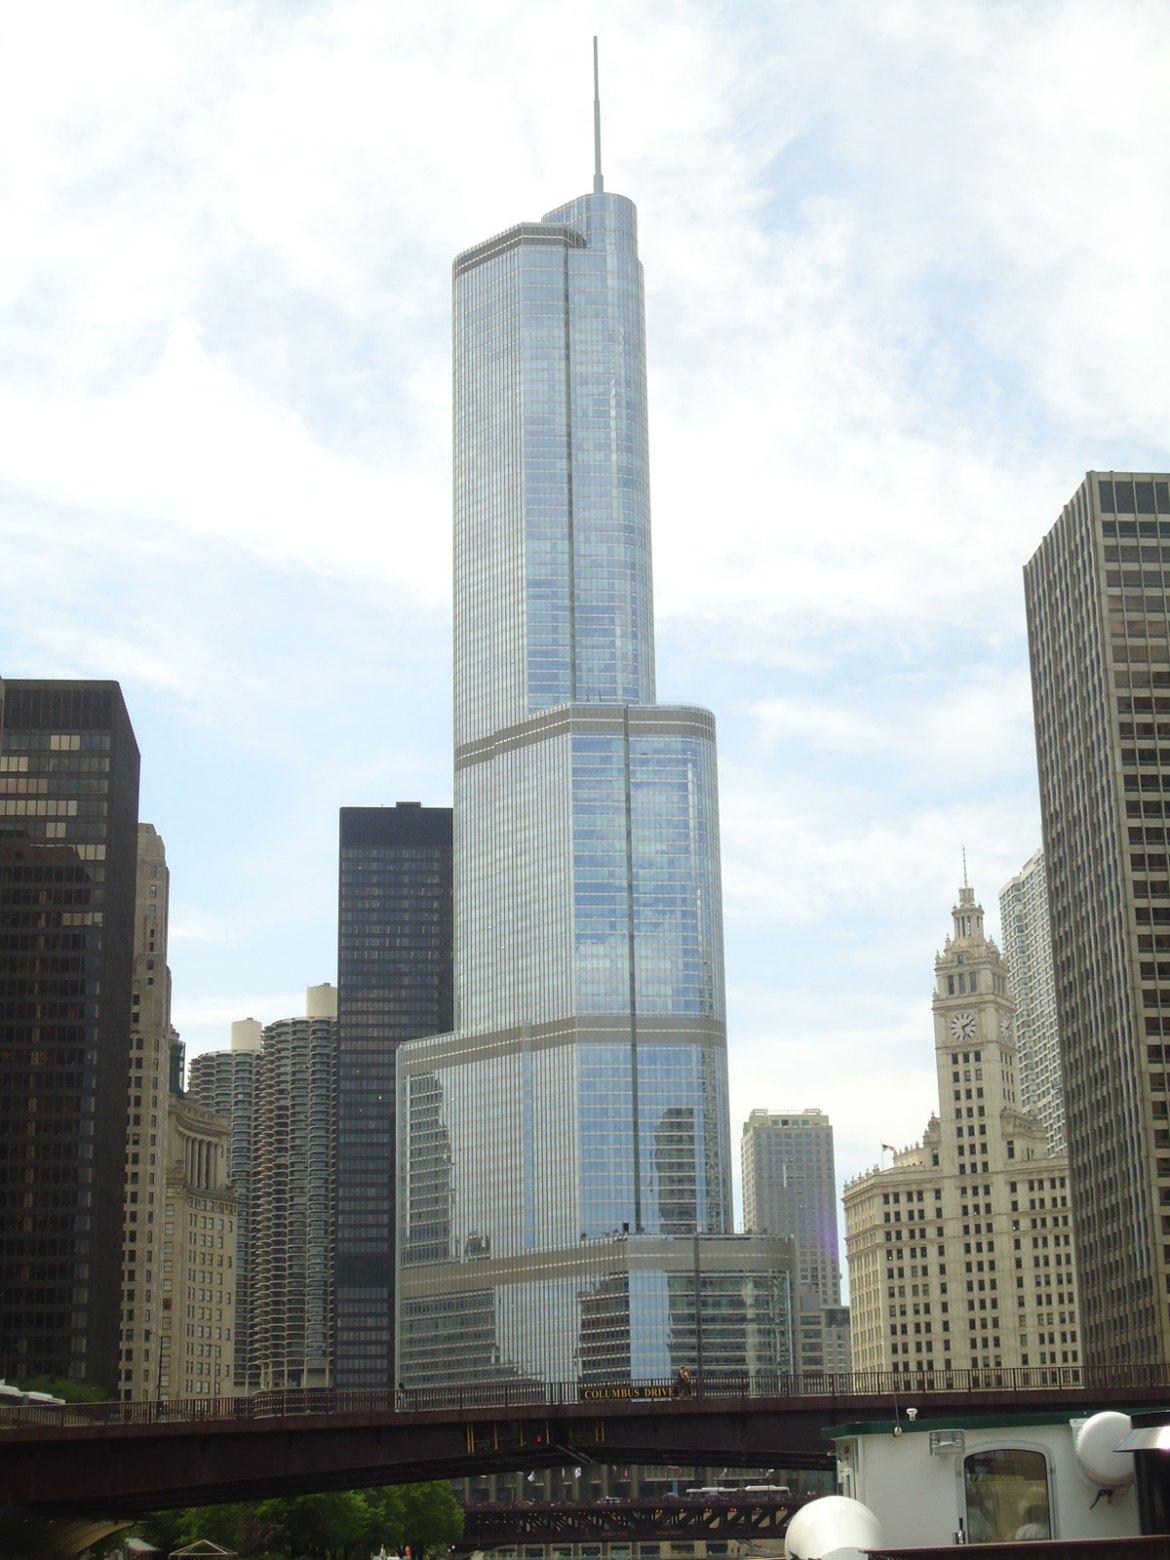 chicago-architecture-river-cruise-7